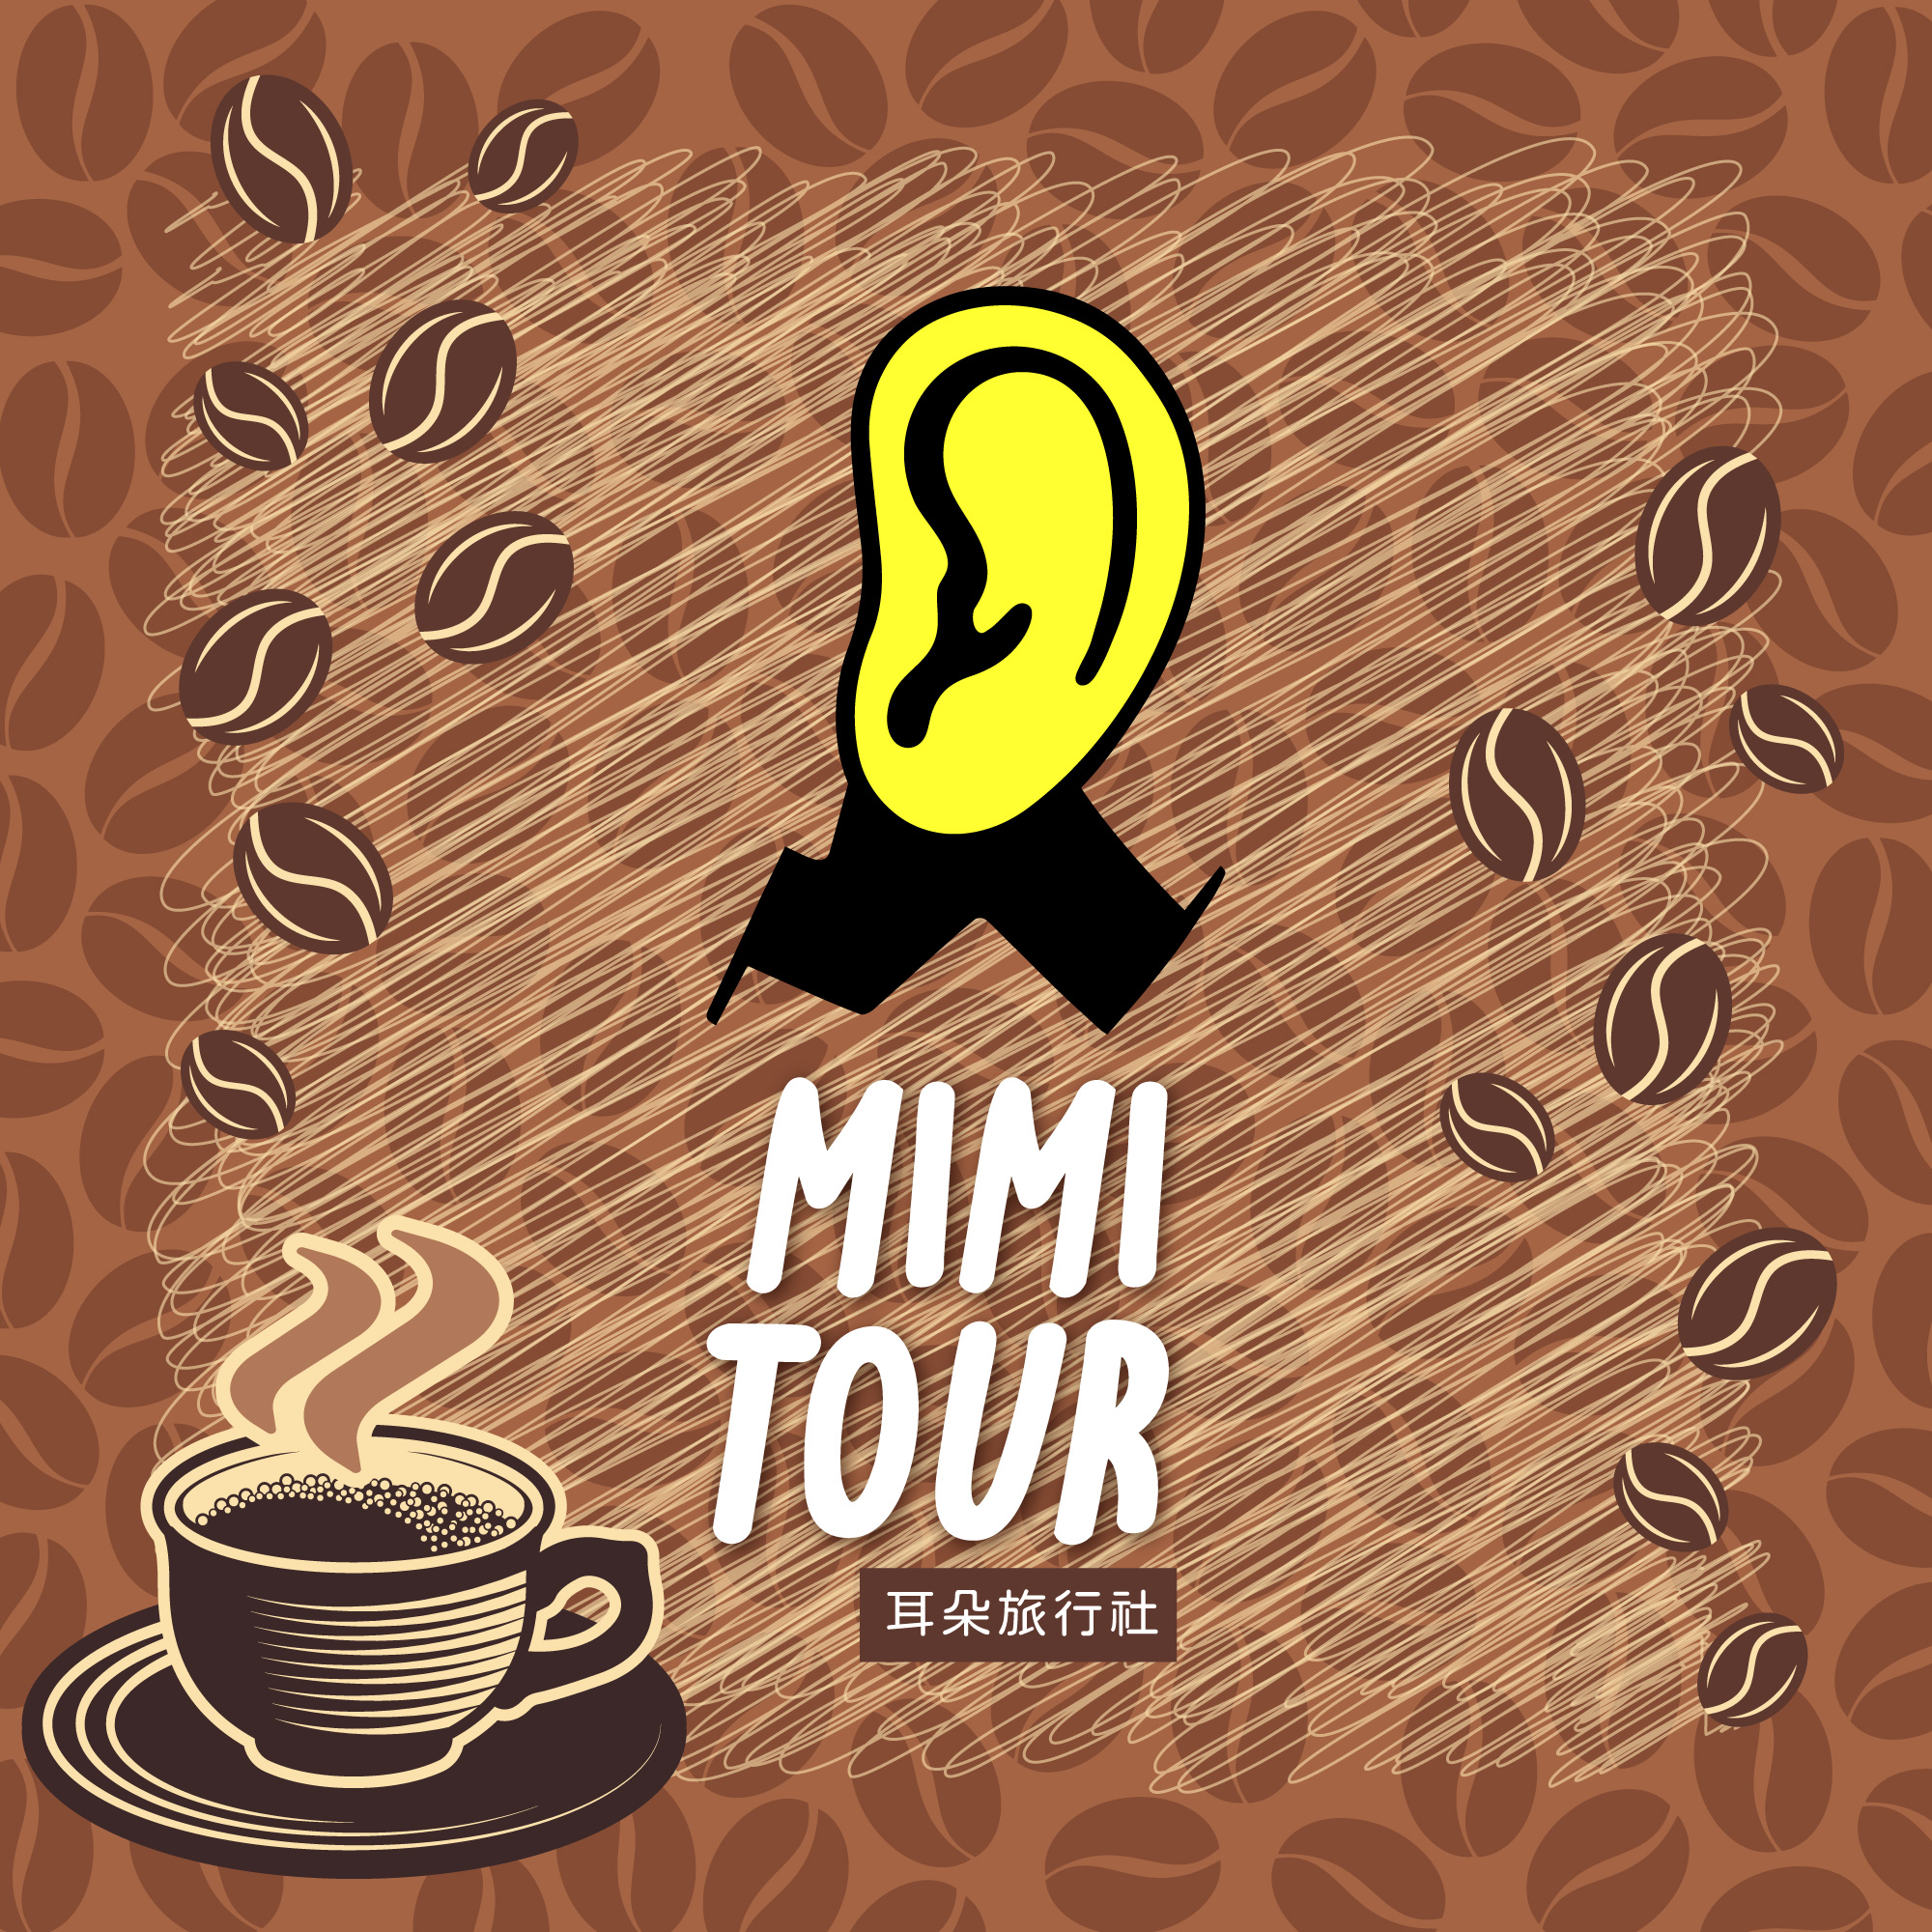 【S2/E42】政穎:茶啡聽4.聊越南咖啡的小耳朵